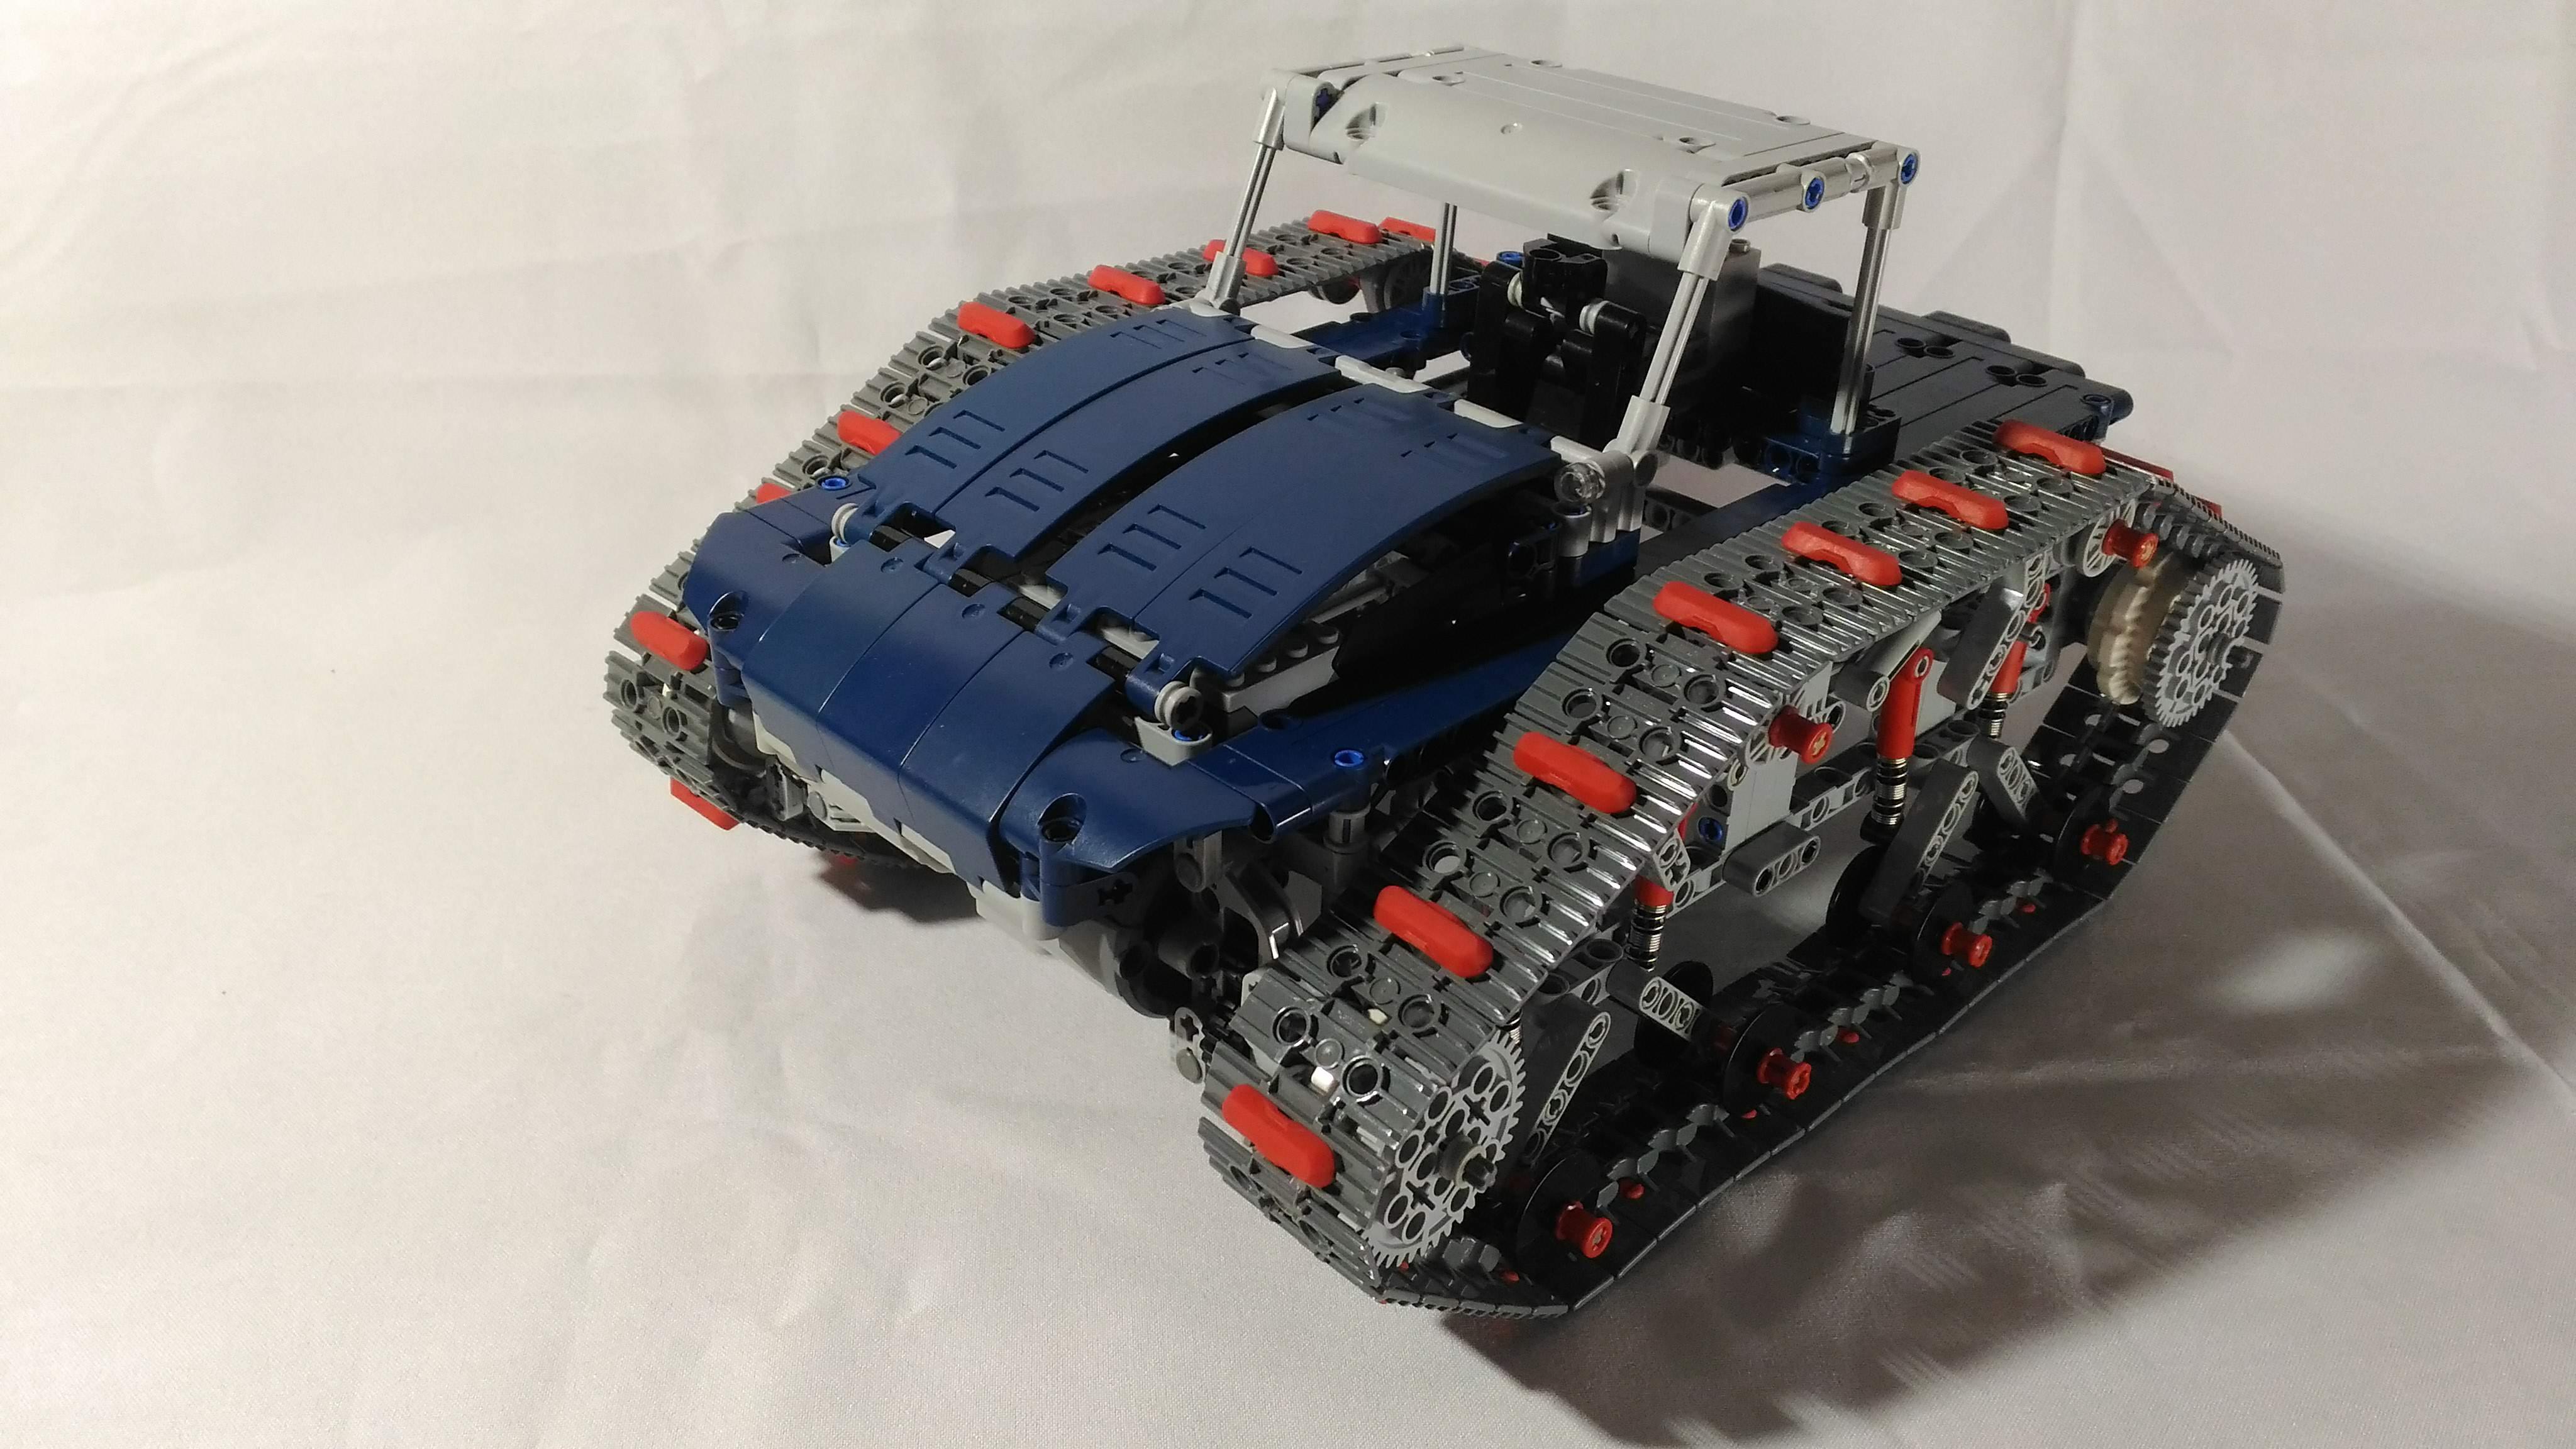 DarkBlueFTW by braker23